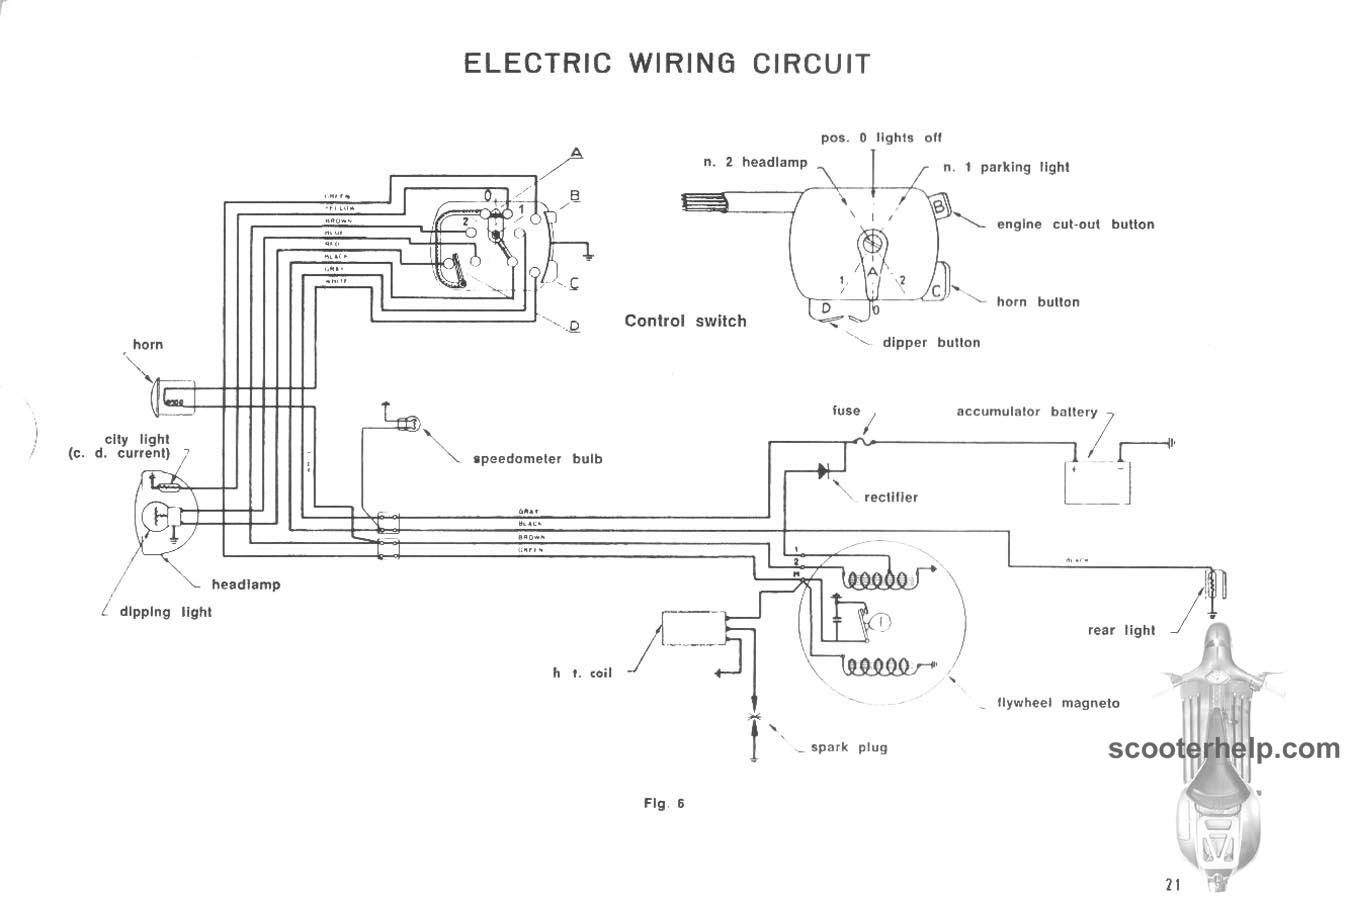 hight resolution of 150 ld factory repair manual 21 150 ld factory repair manual electric scooter wiring diagrams at